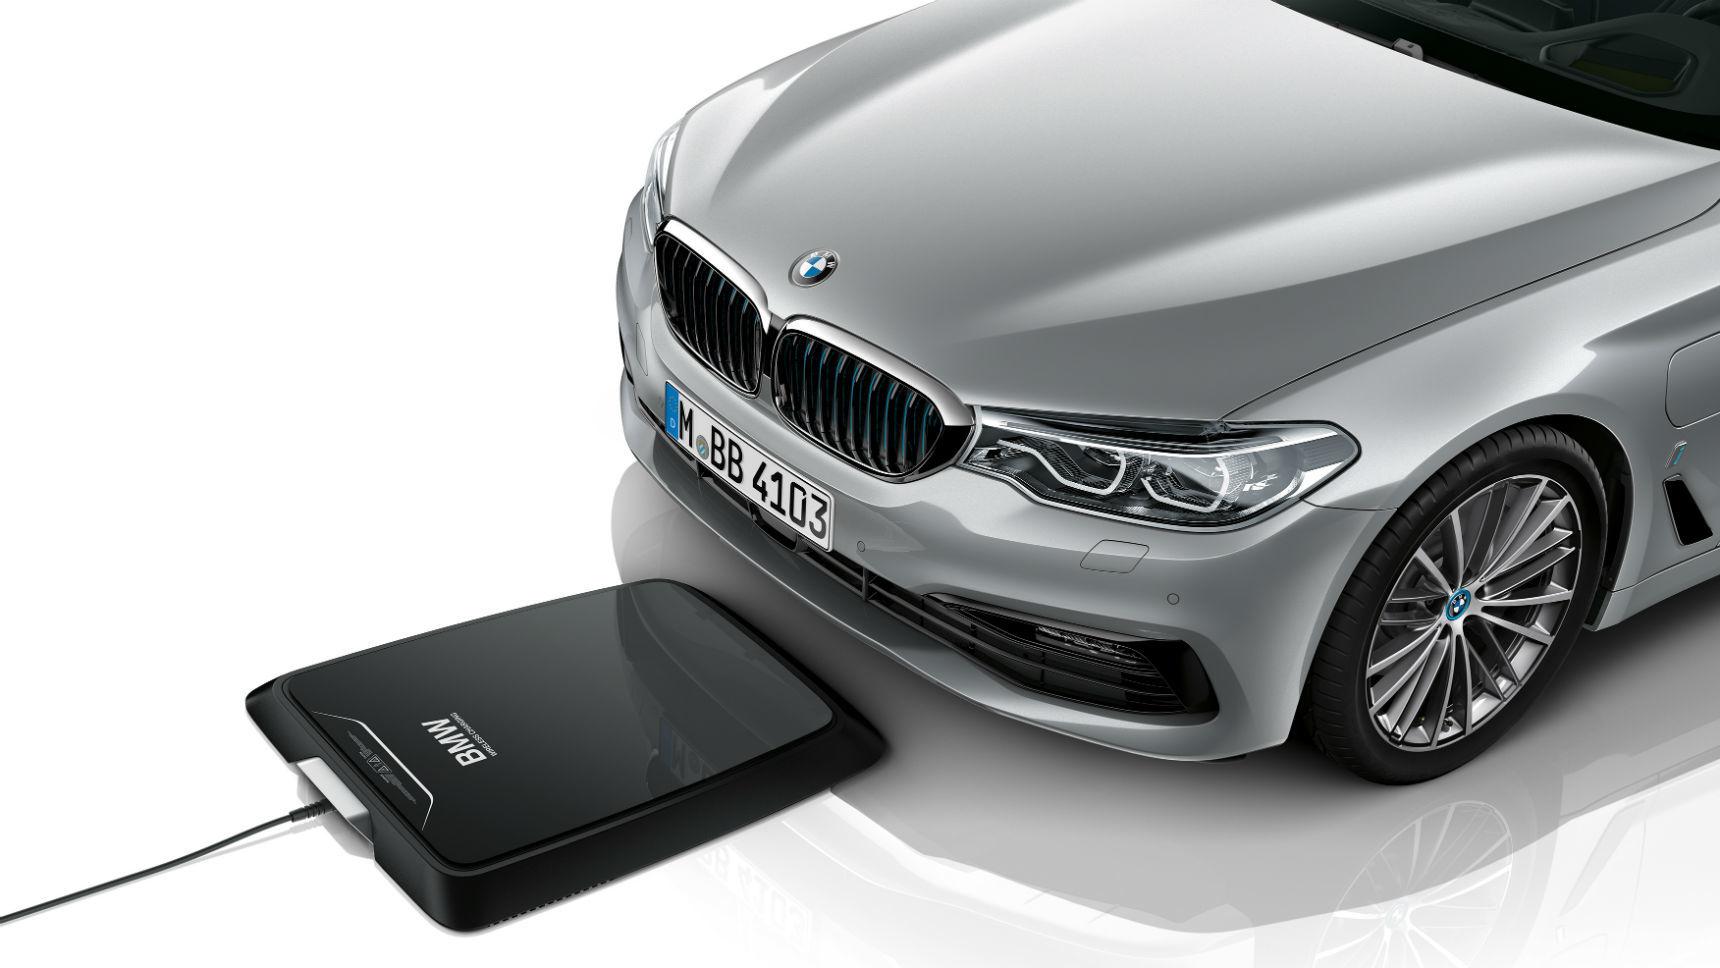 Электрокары BMW получат беспроводную зарядку